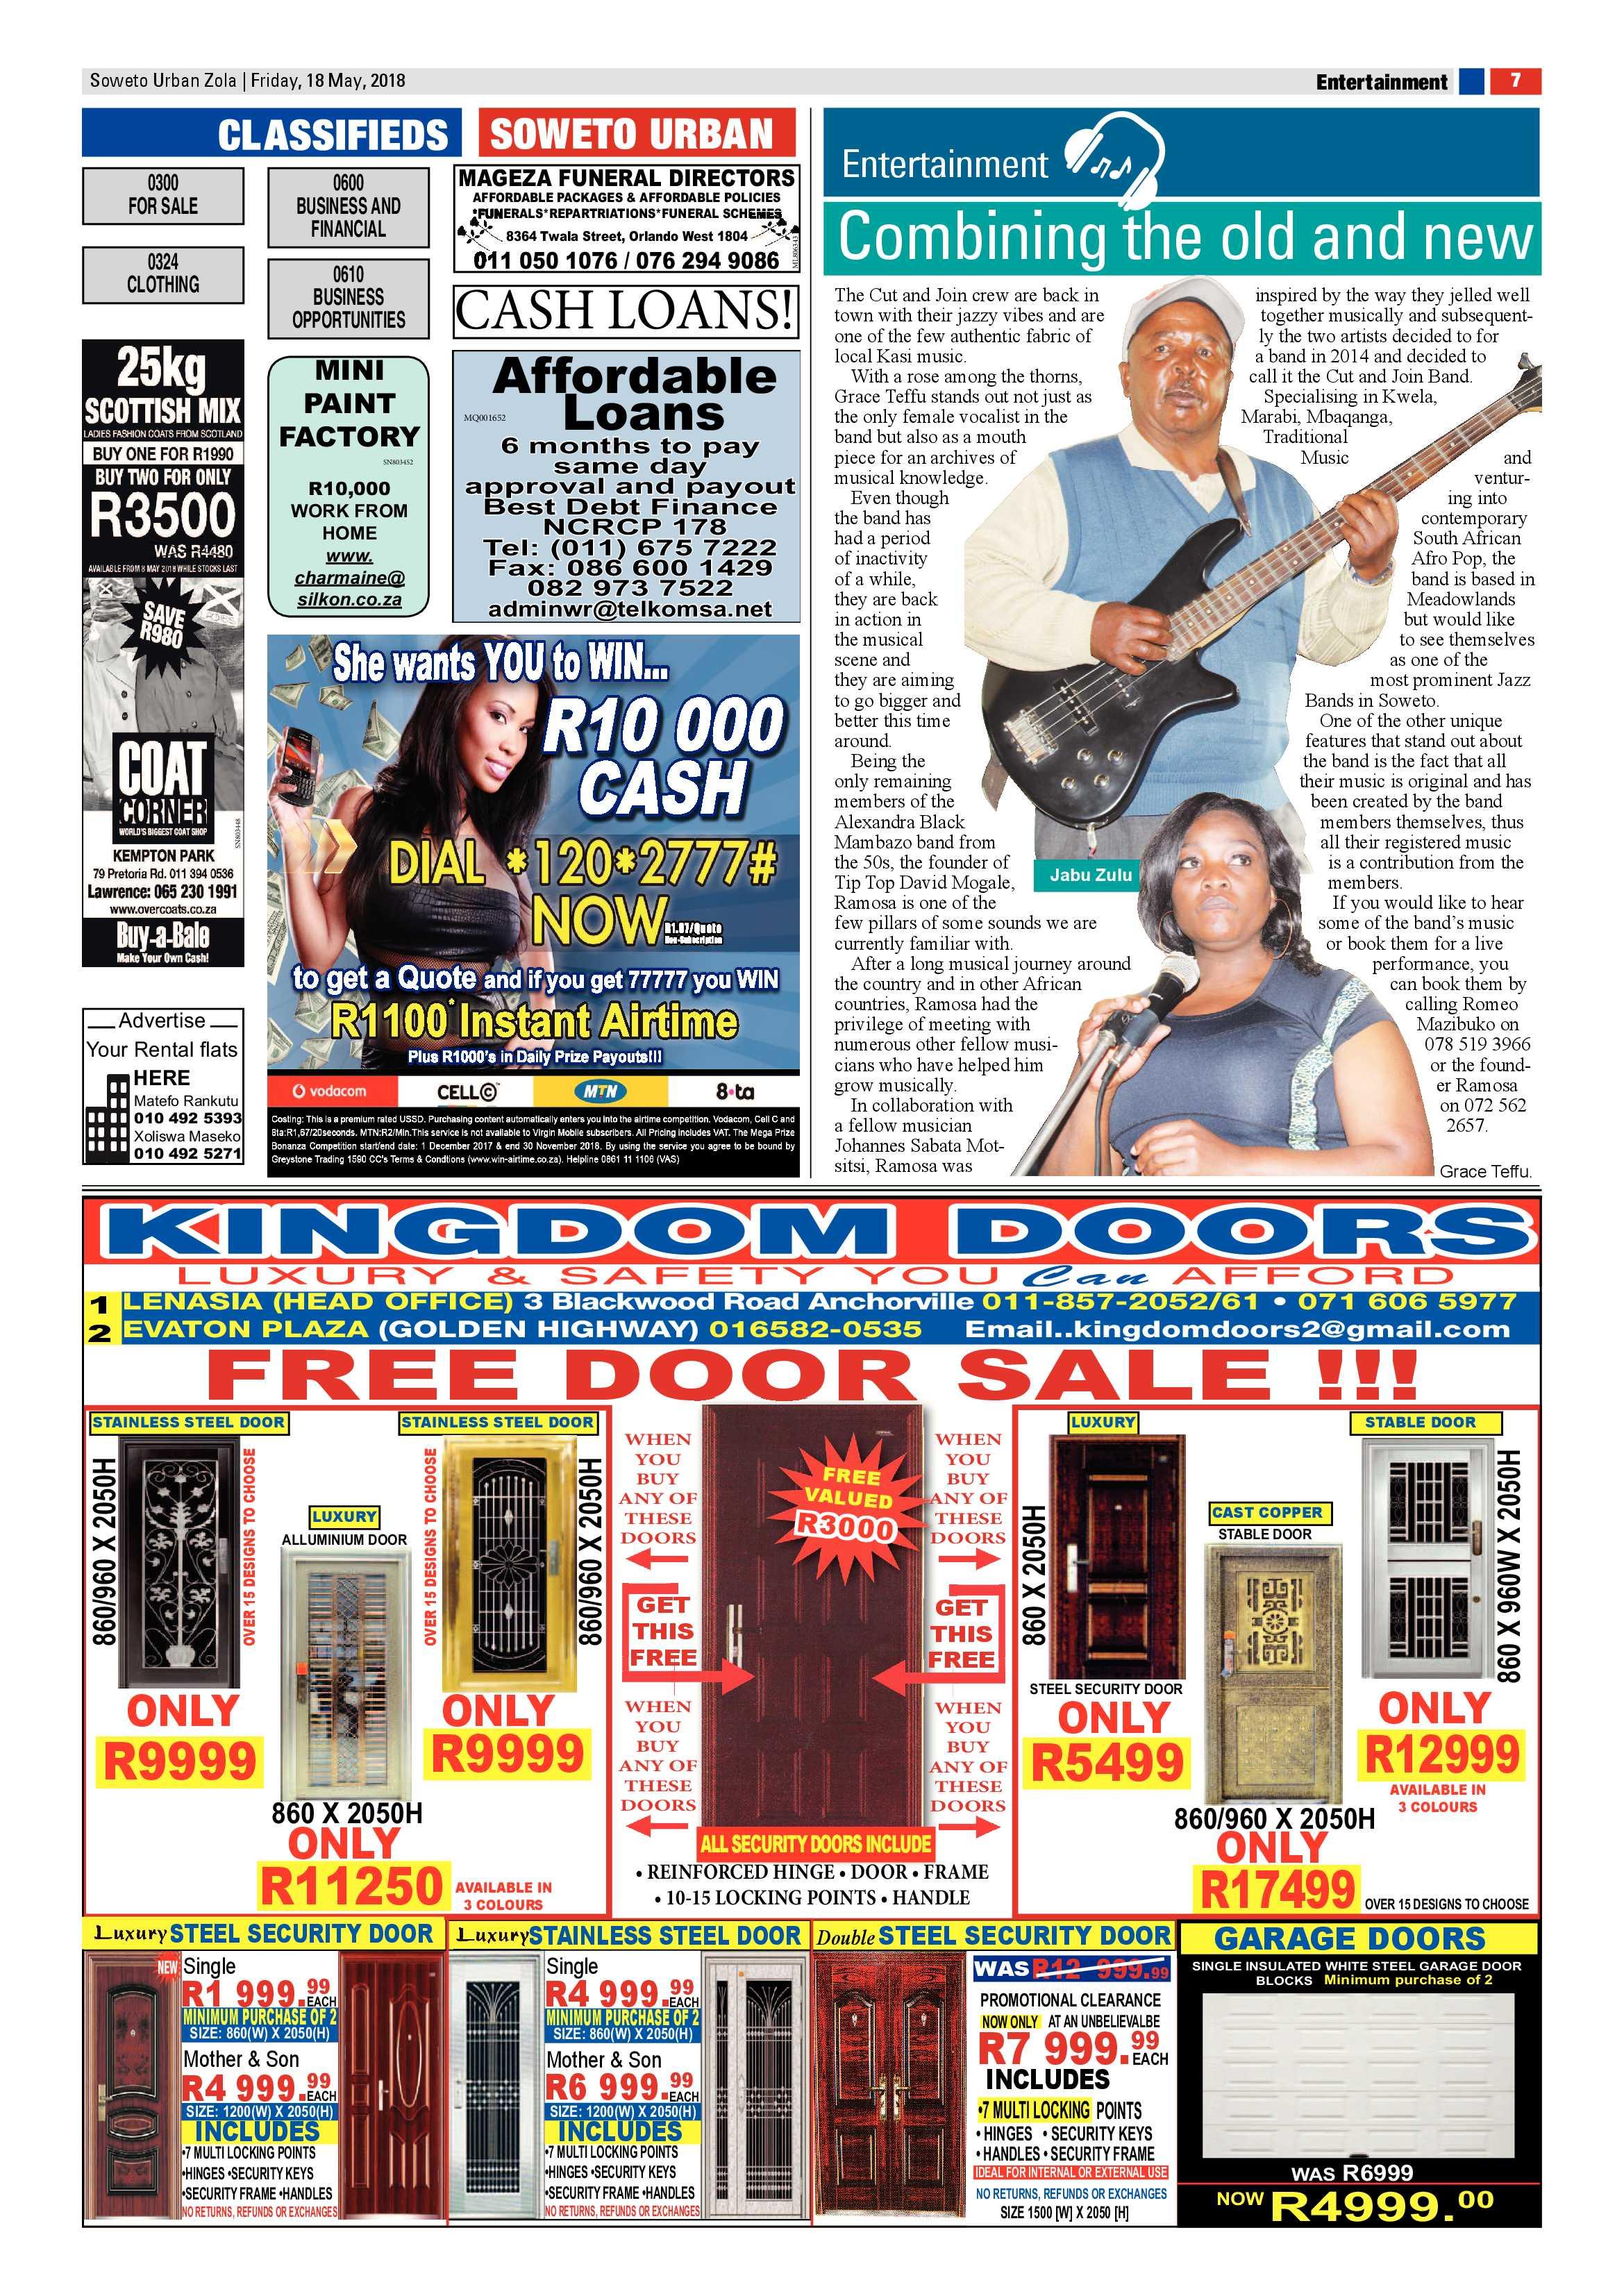 Zola – May 18, 2018 issue | Soweto Urban